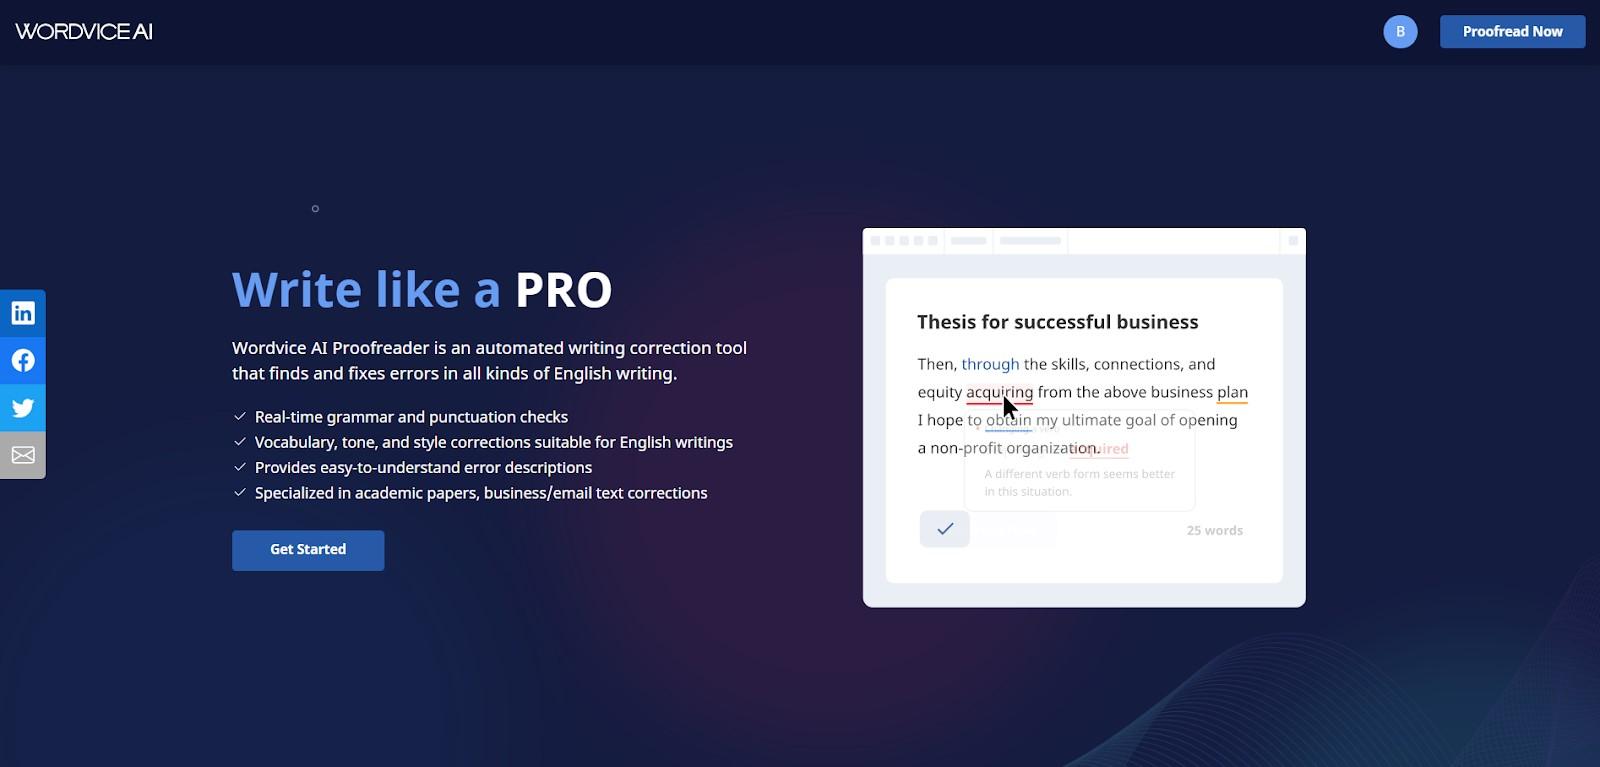 wordvice ai main page screenshot